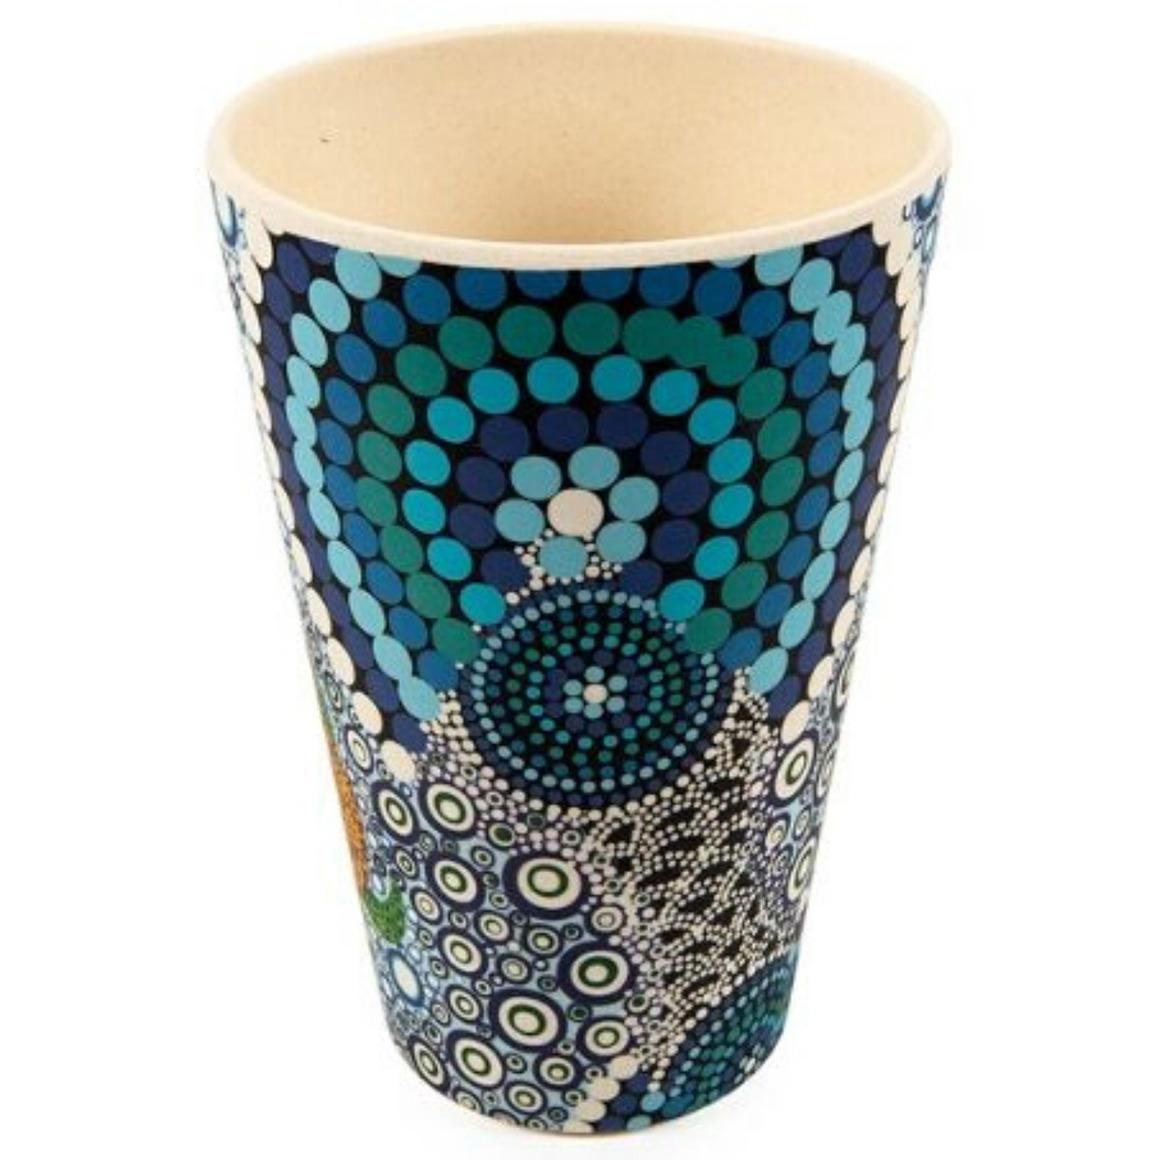 Tumblers Bamboo Aboriginal Design   - Colours of the Reef Design - Colin Jones  (Set of 2)   Trada Marketplace